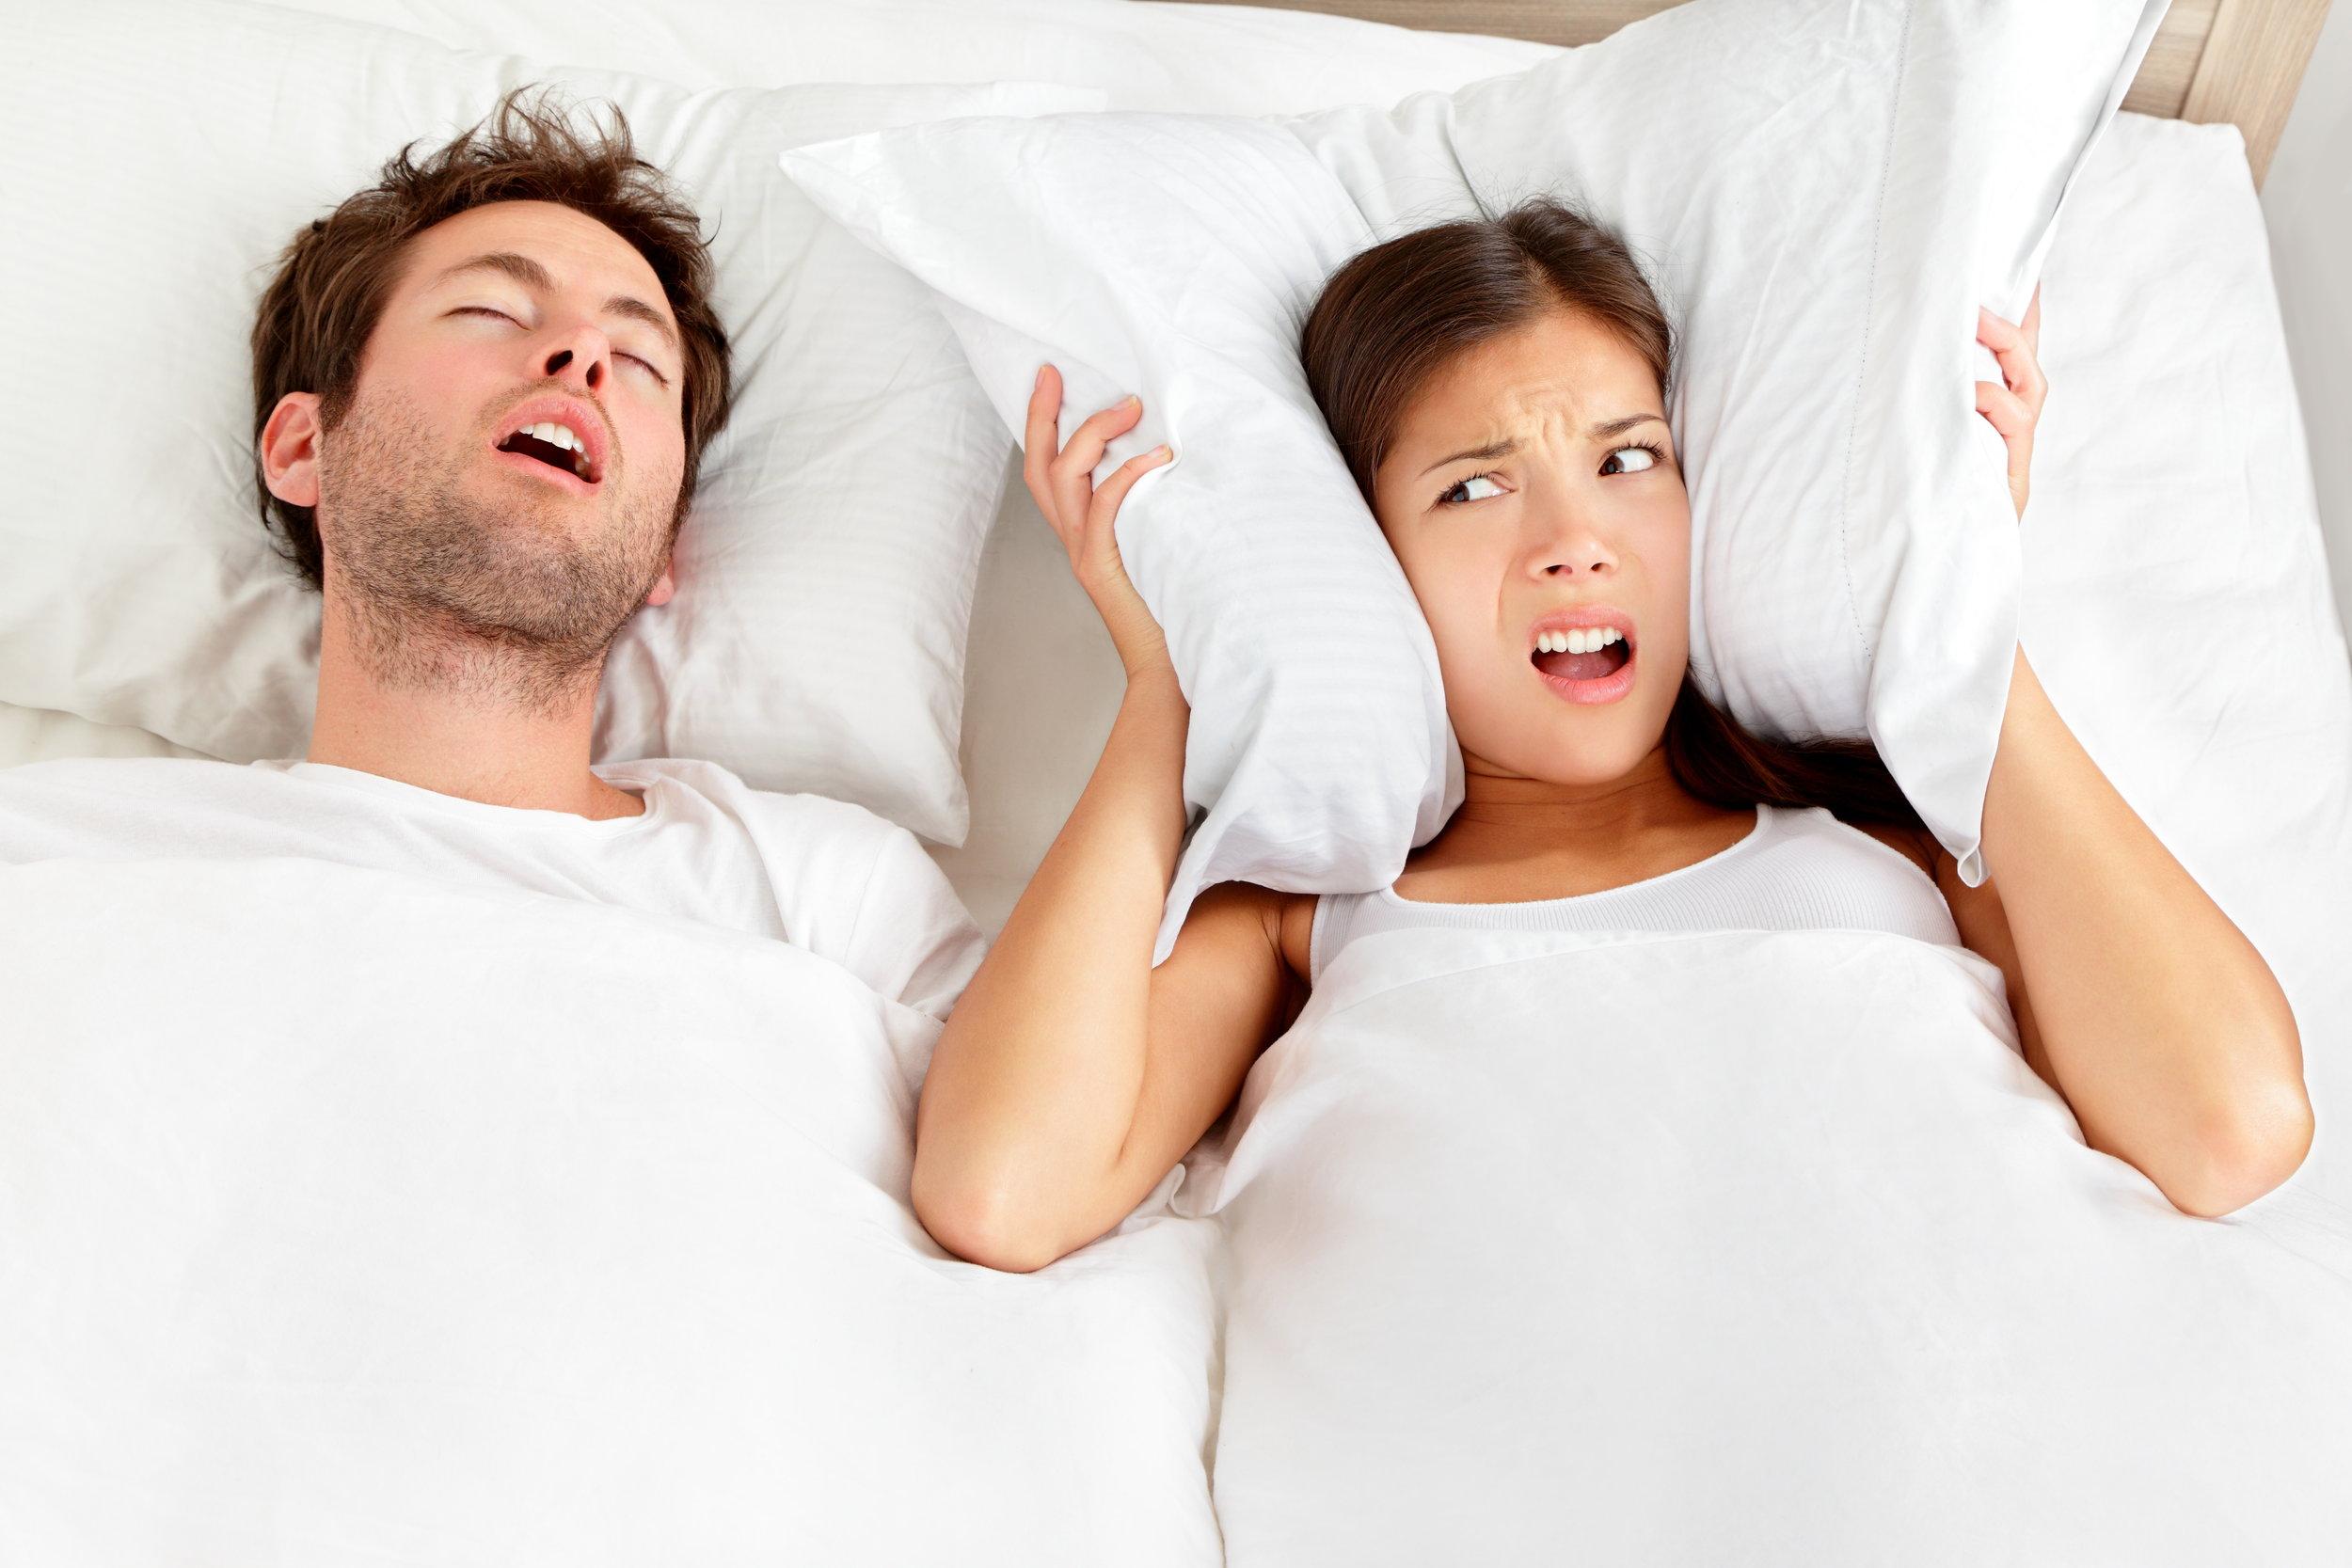 SNORING / DENTAL SLEEP MEDICINE / SLEEP APNEA